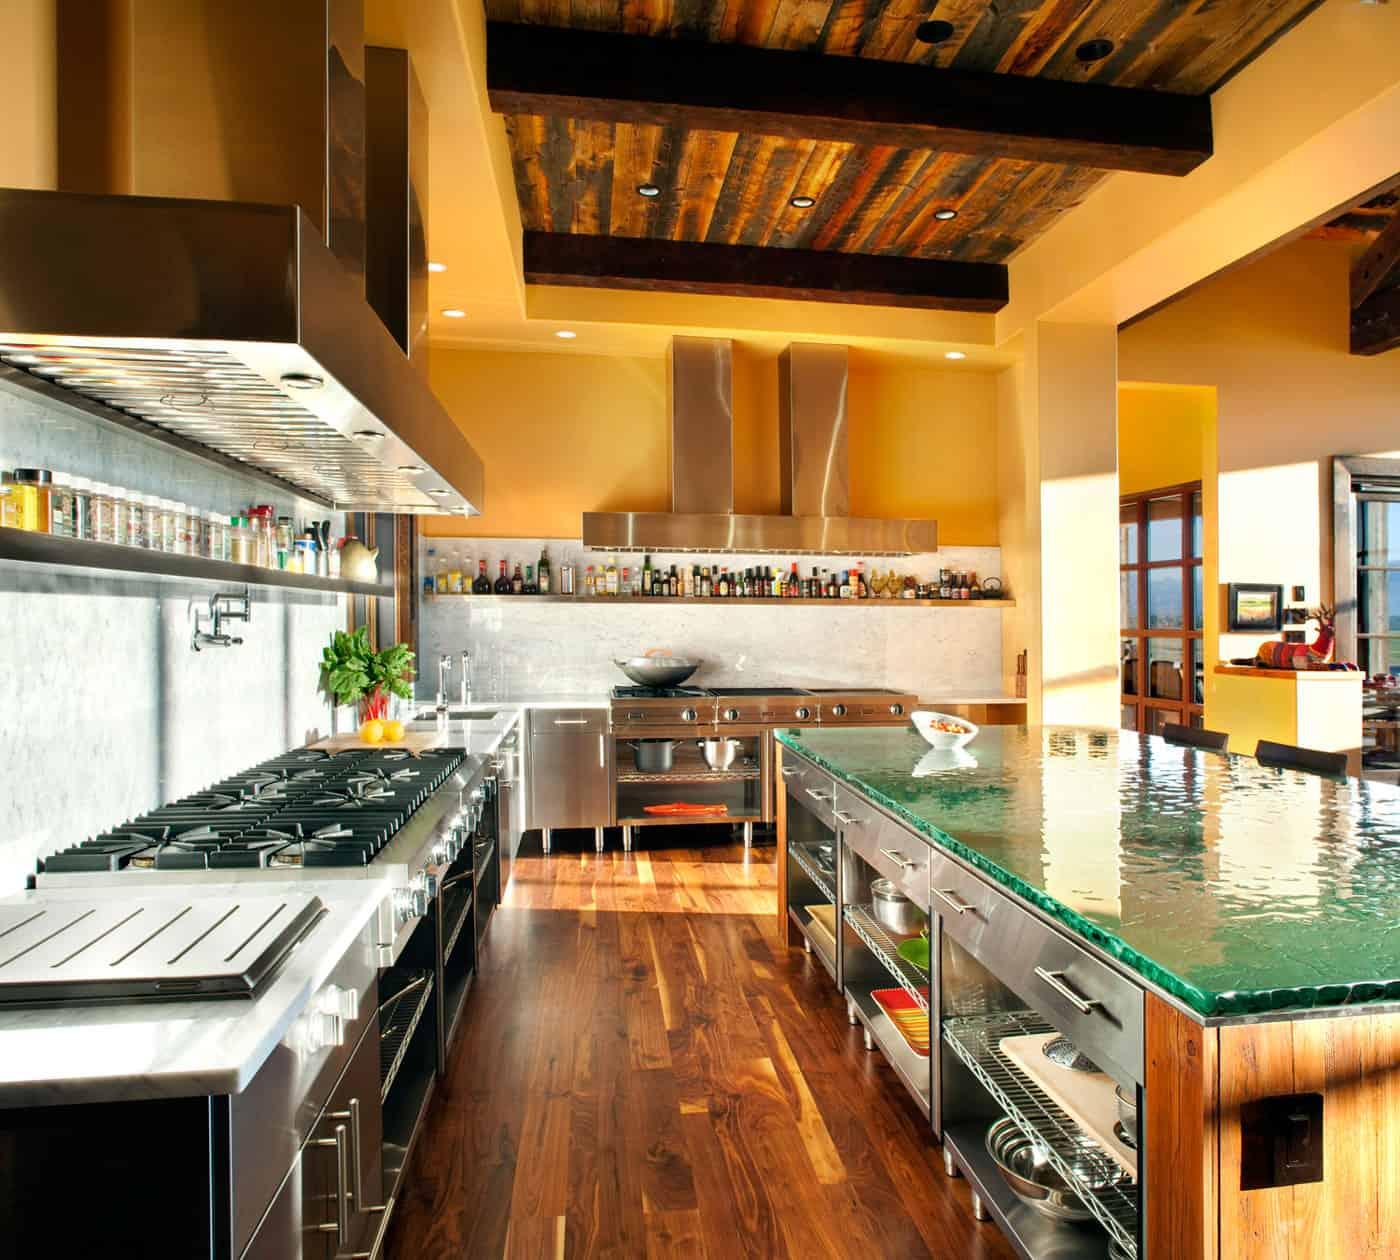 Stock Farm Residence by Locati Architects